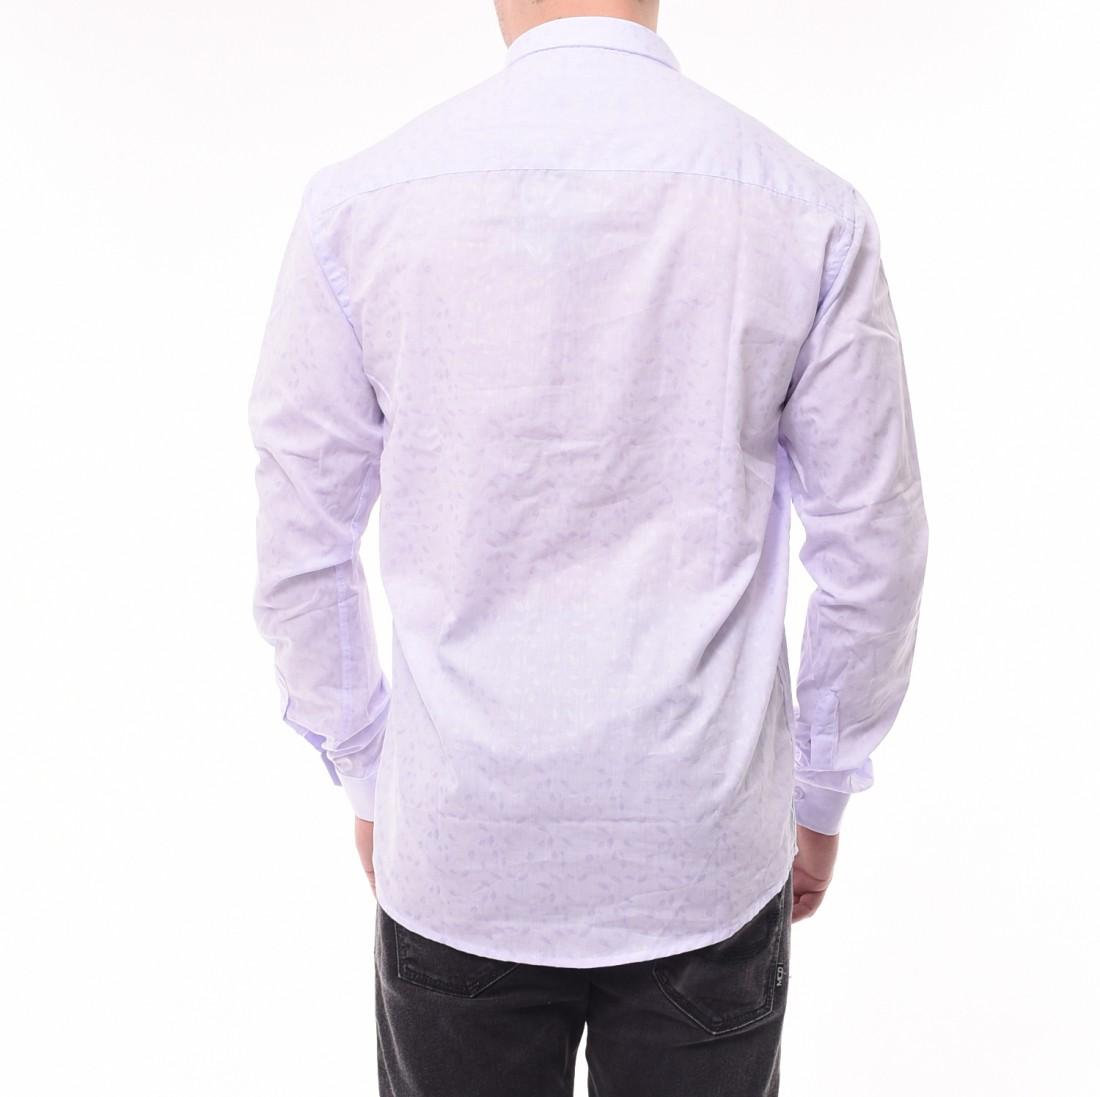 ccad331c5d4 Camisa Ogochi Super Slim Jacquard Lilás · Camisa Ogochi Super Slim Jacquard  Lilás